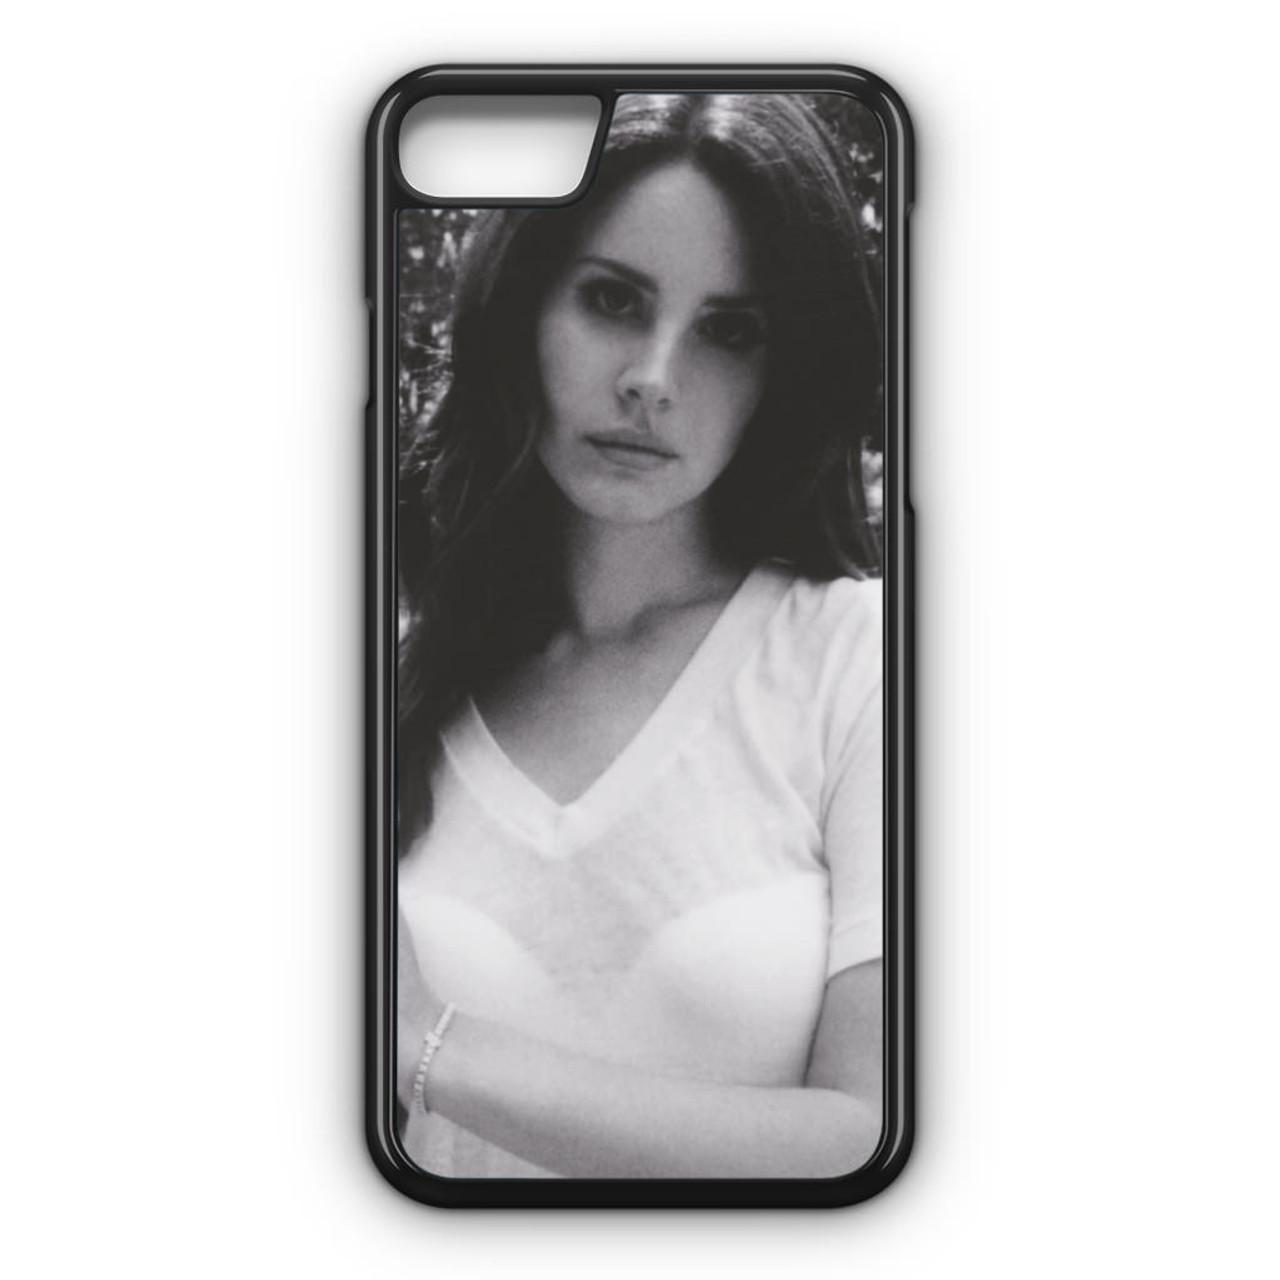 Lana Del Rey Ultraviolence IPhone 8 Case